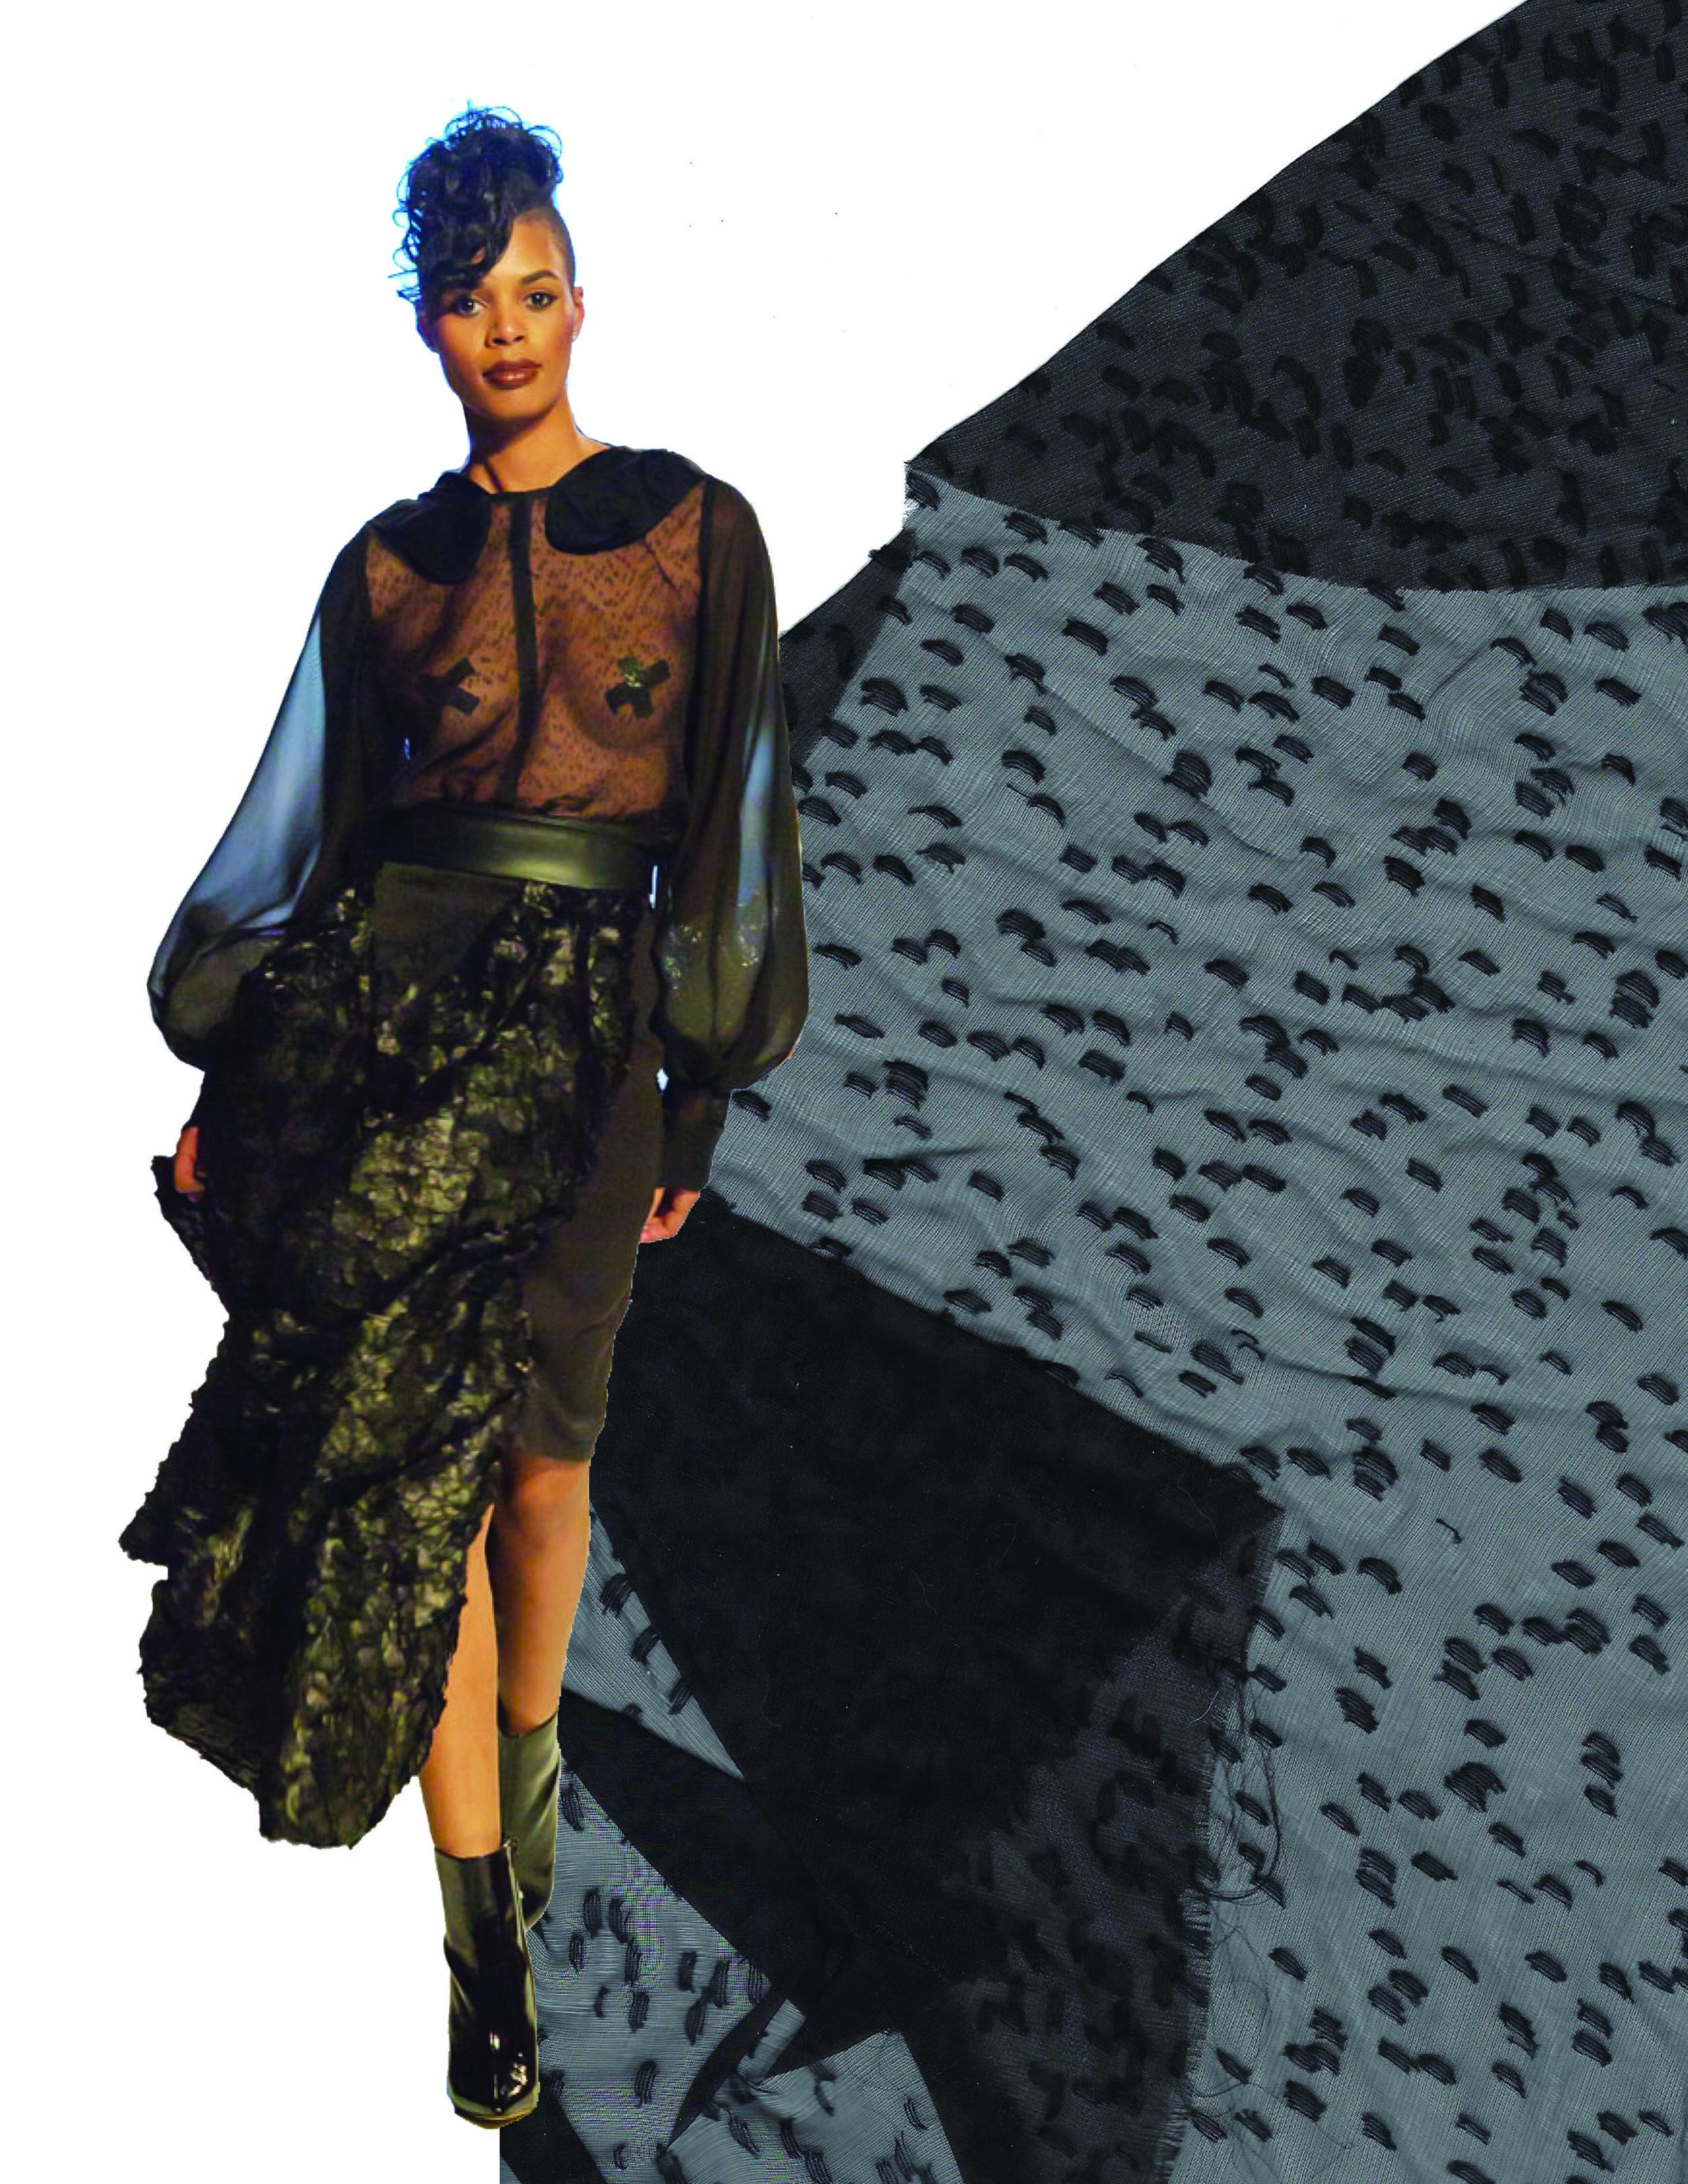 fashion show images soread page 2.jpg